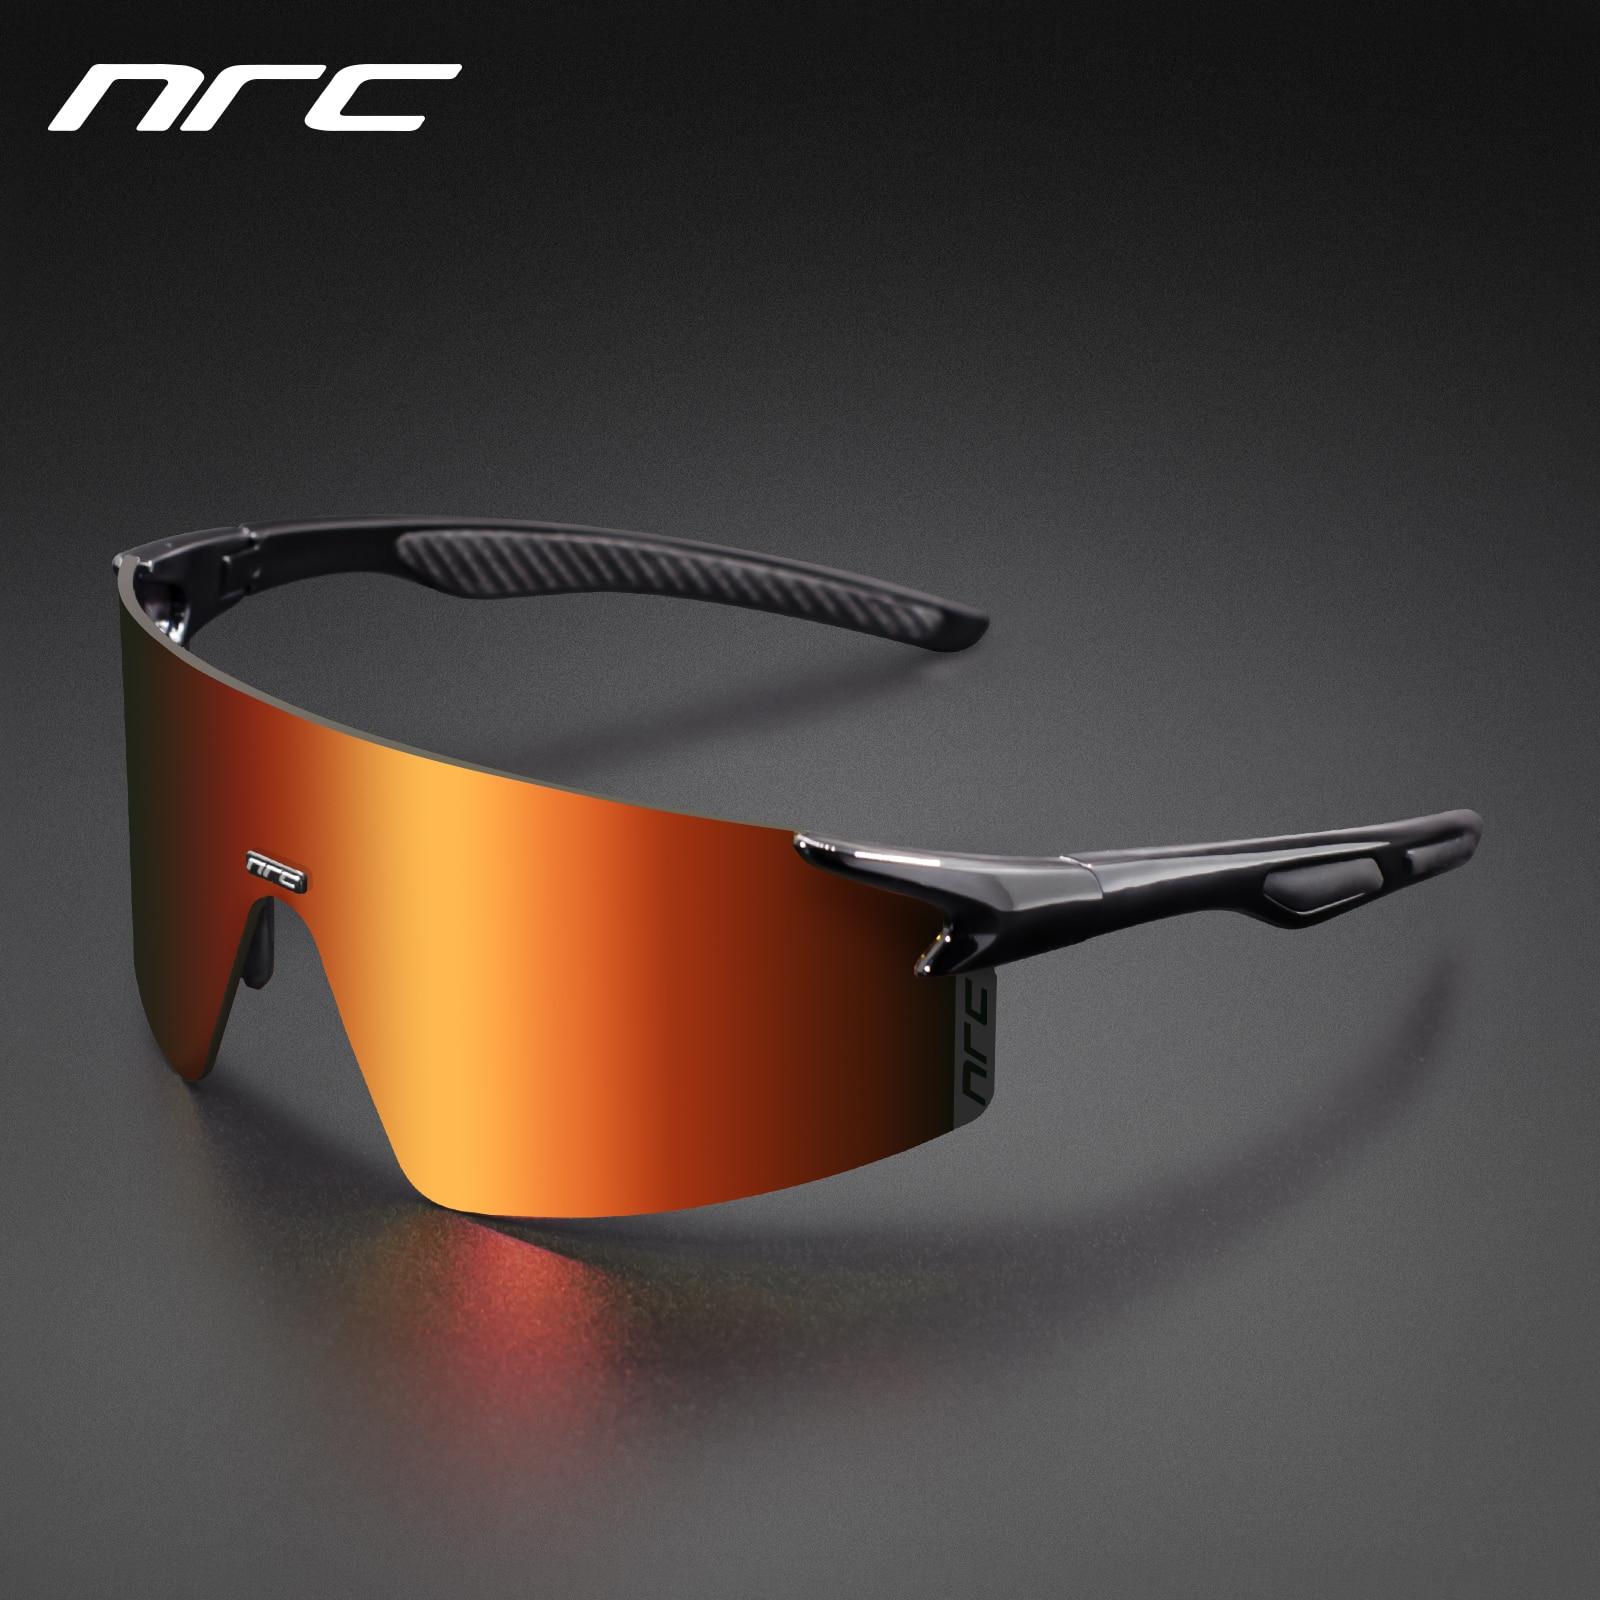 Gafas fotocromáticas para Ciclismo, lentes de sol deportivas polarizadas para bicicleta de...